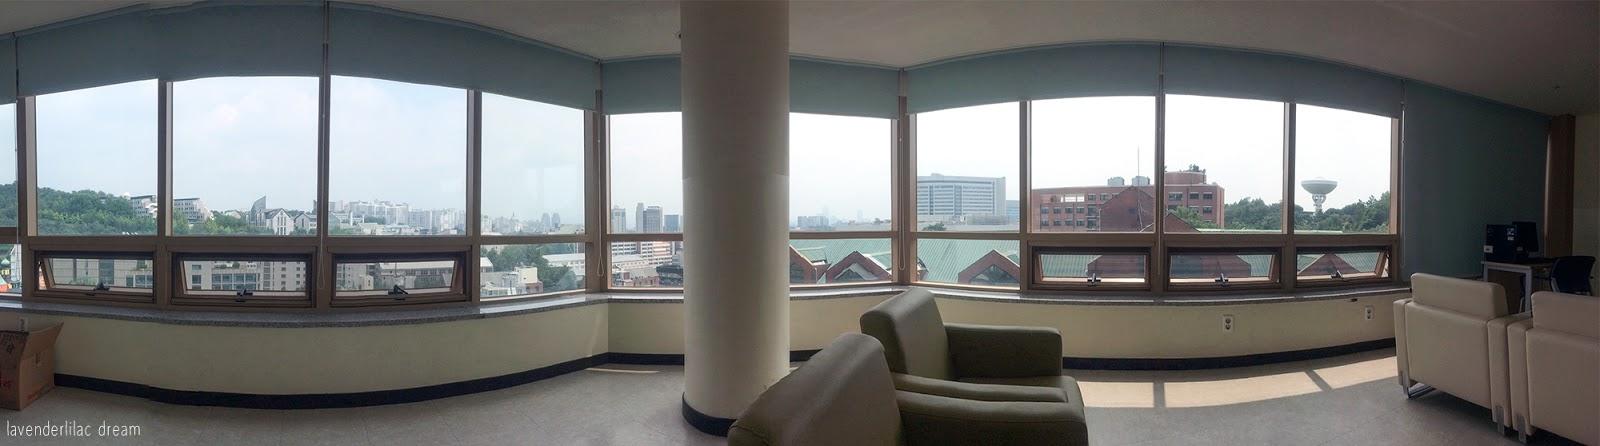 South Korea, Seoul, Sinchon, YISS 2014, Yonsei University, SK Global House, 7th floor lounge view